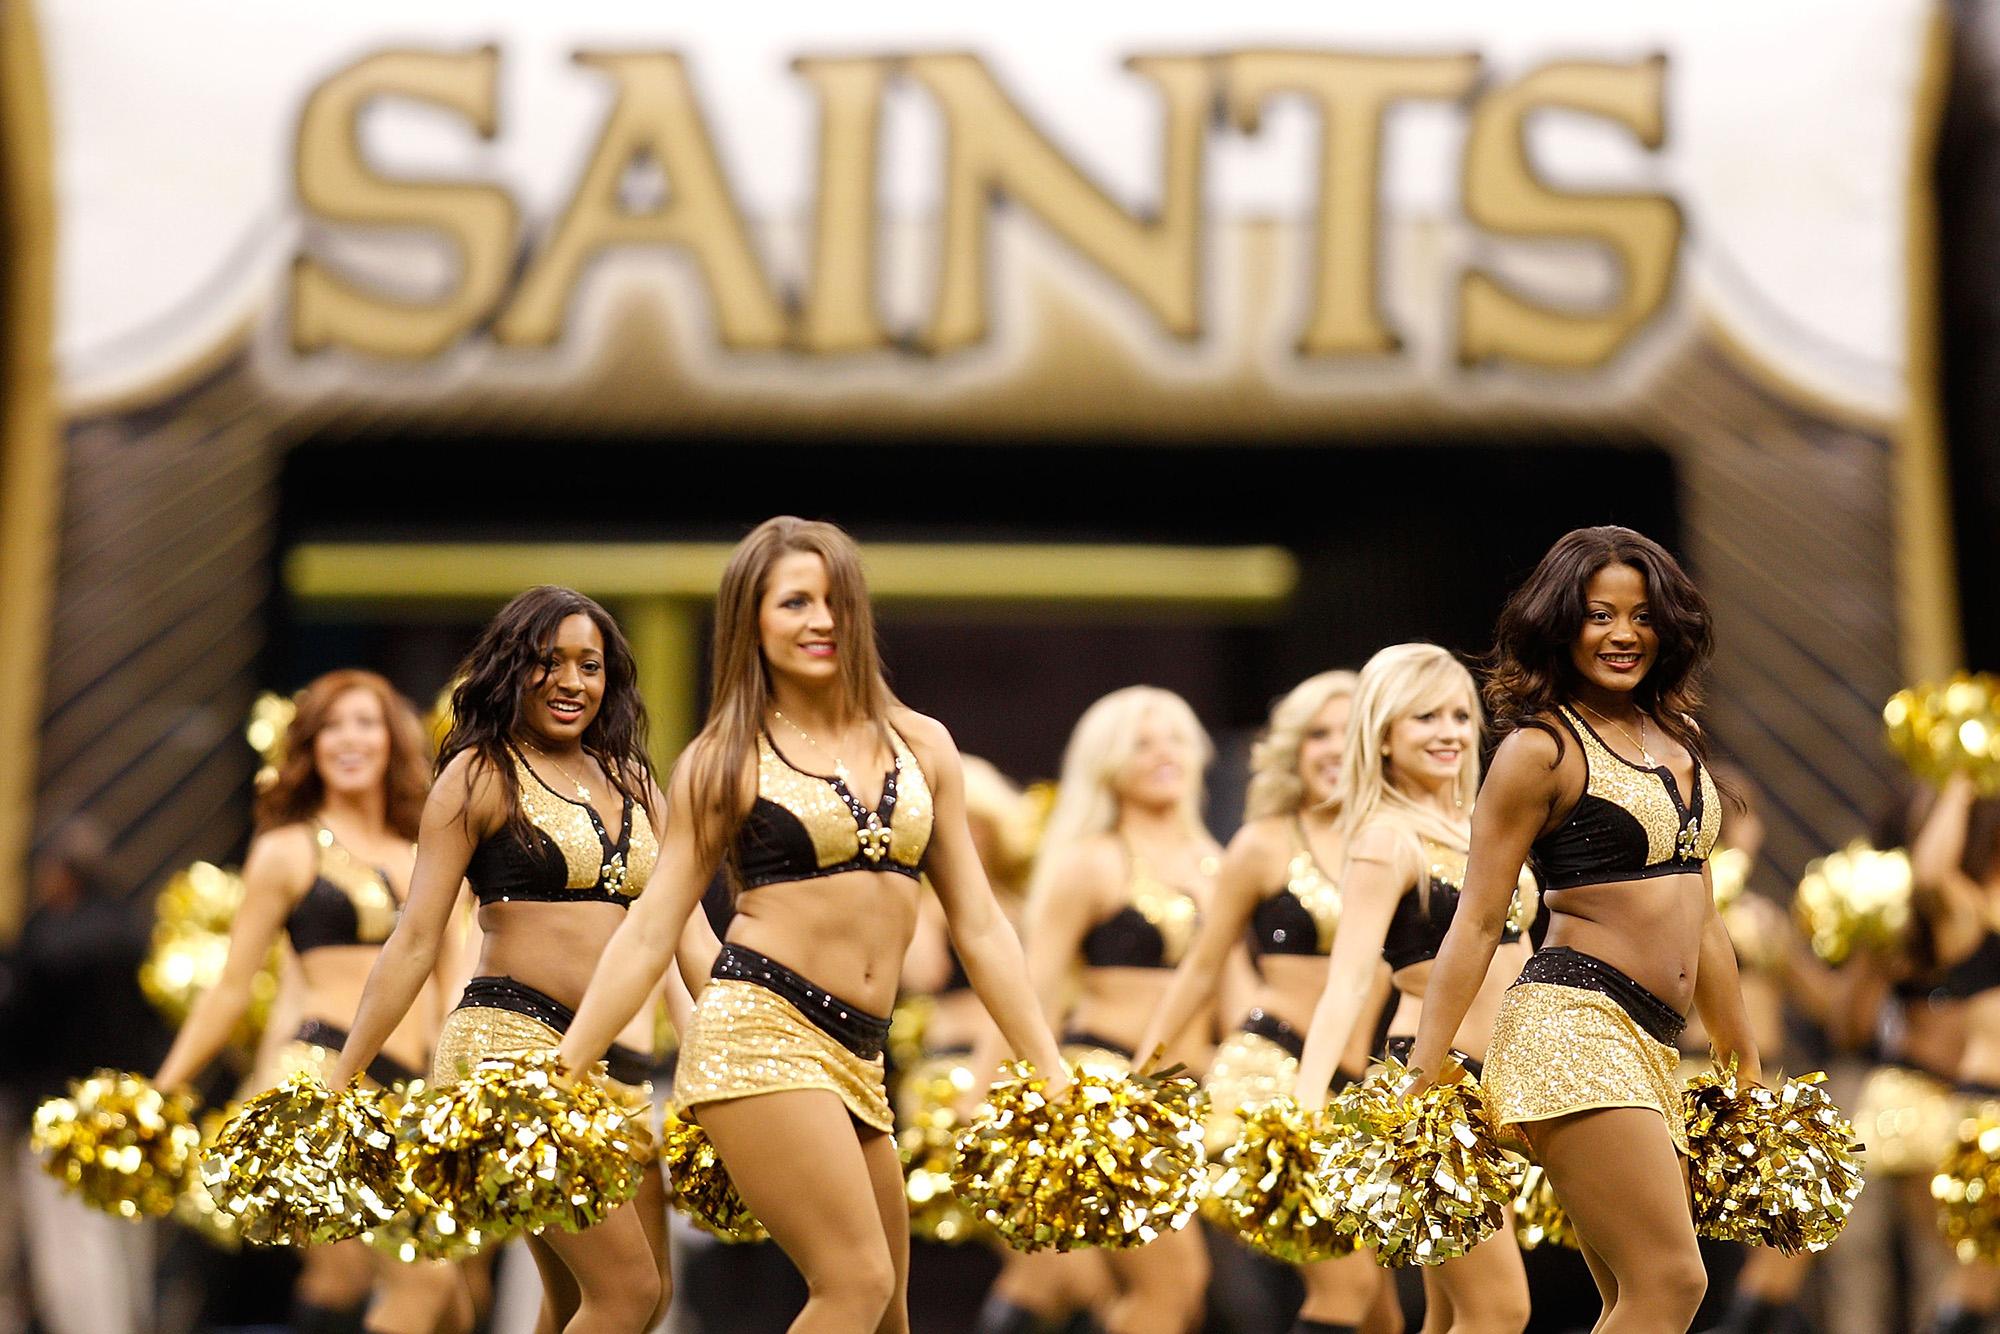 The gameday nightmare Saints